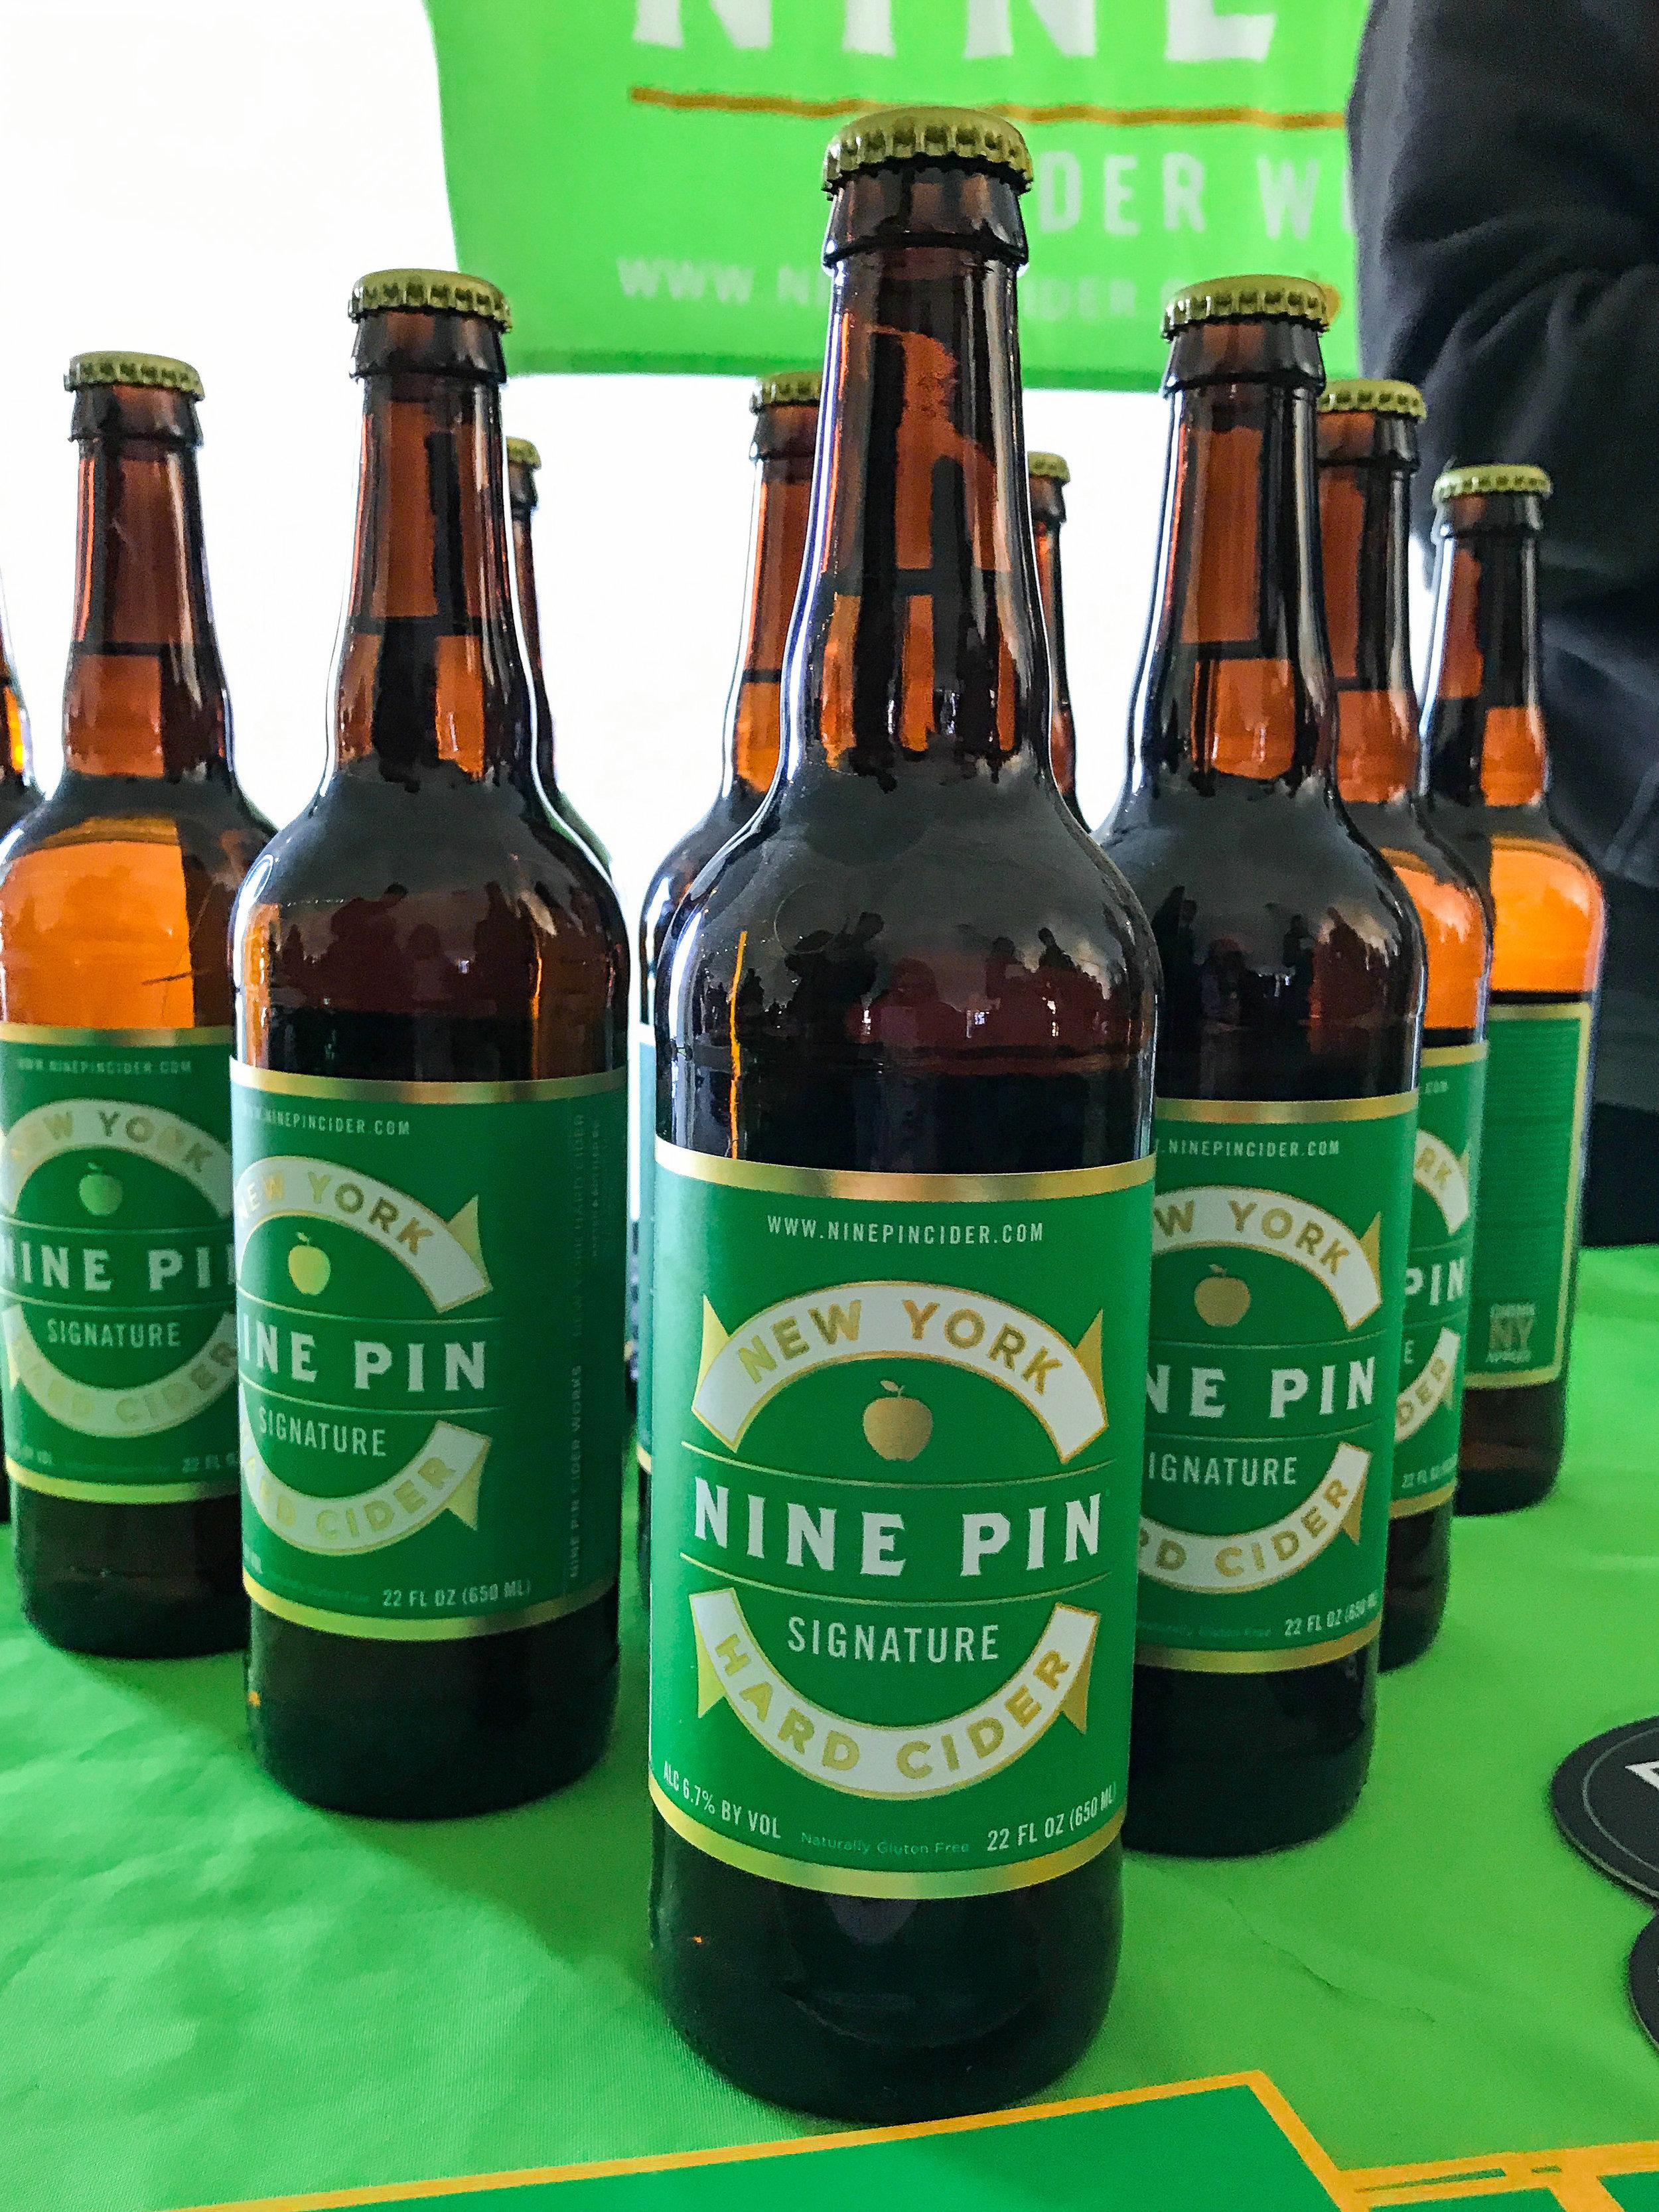 Nine Pin's Signature cider